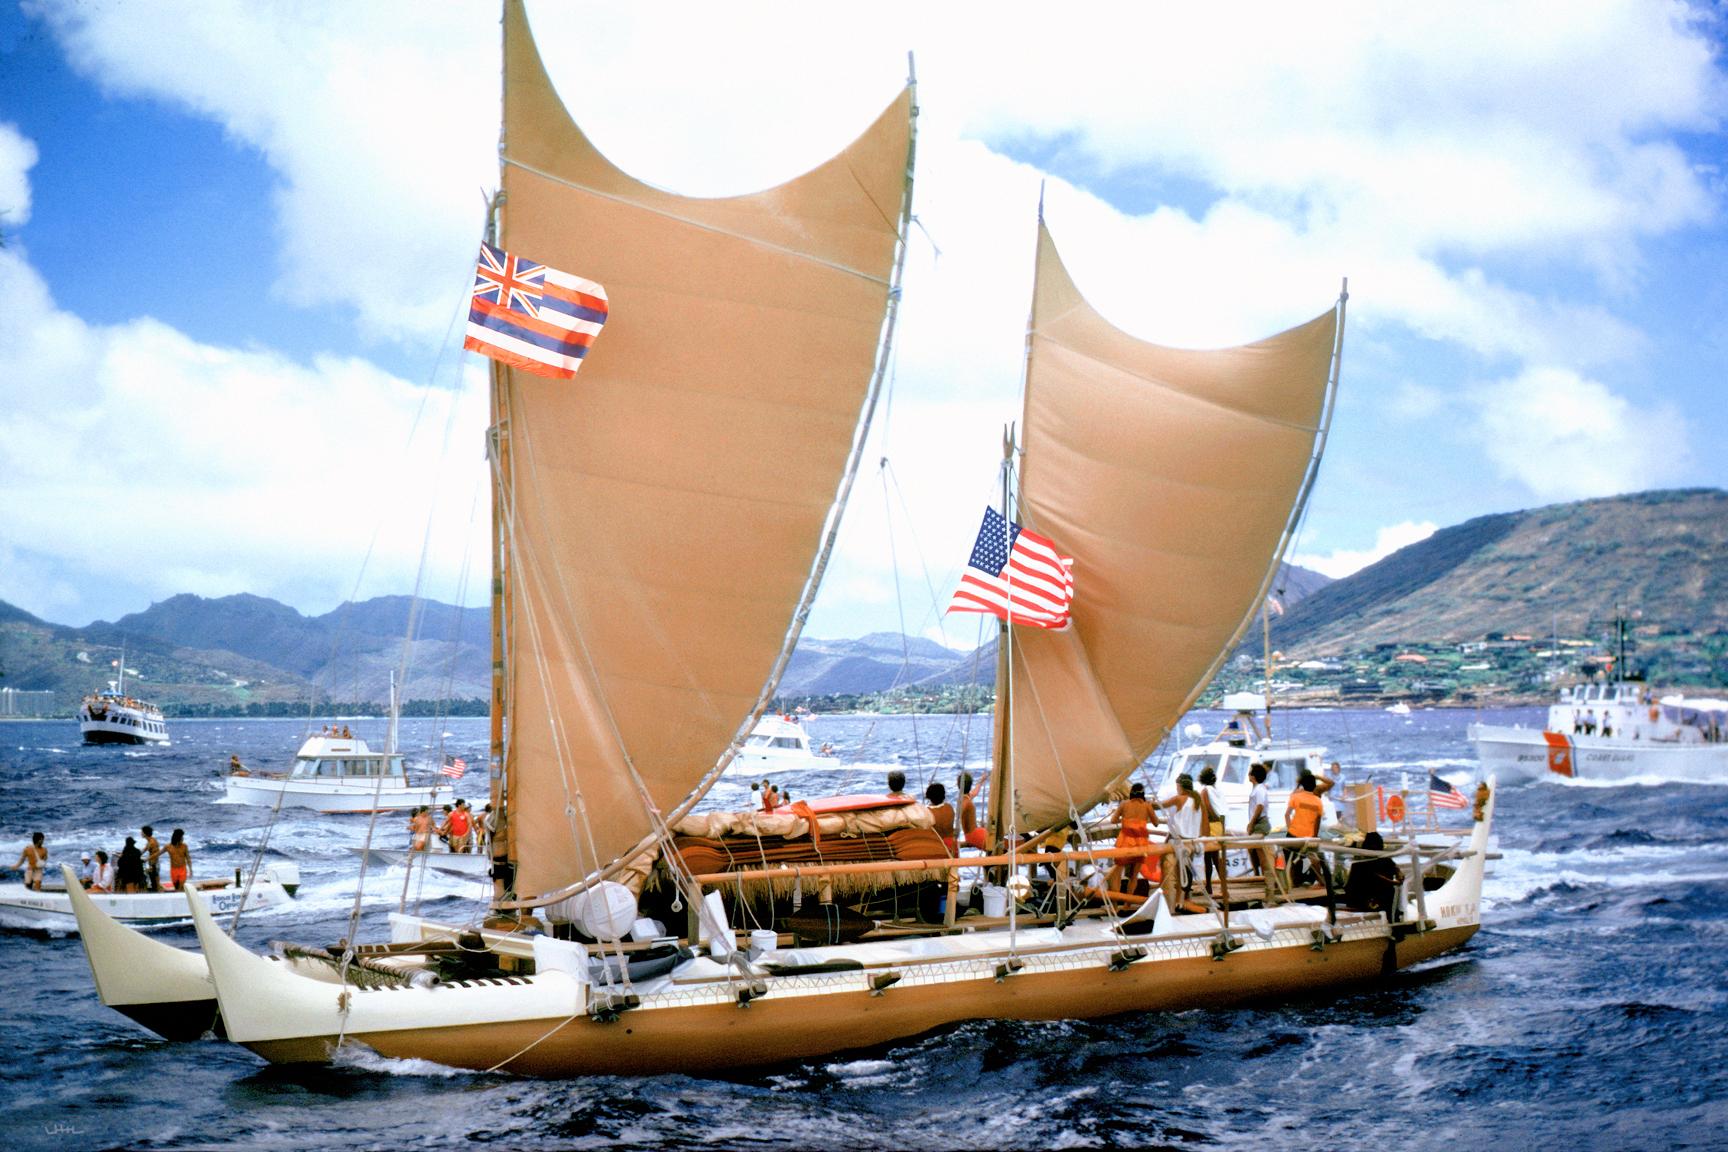 The Hōkūleʻa: Saling to Preserve Ancient Knowledge | EWC